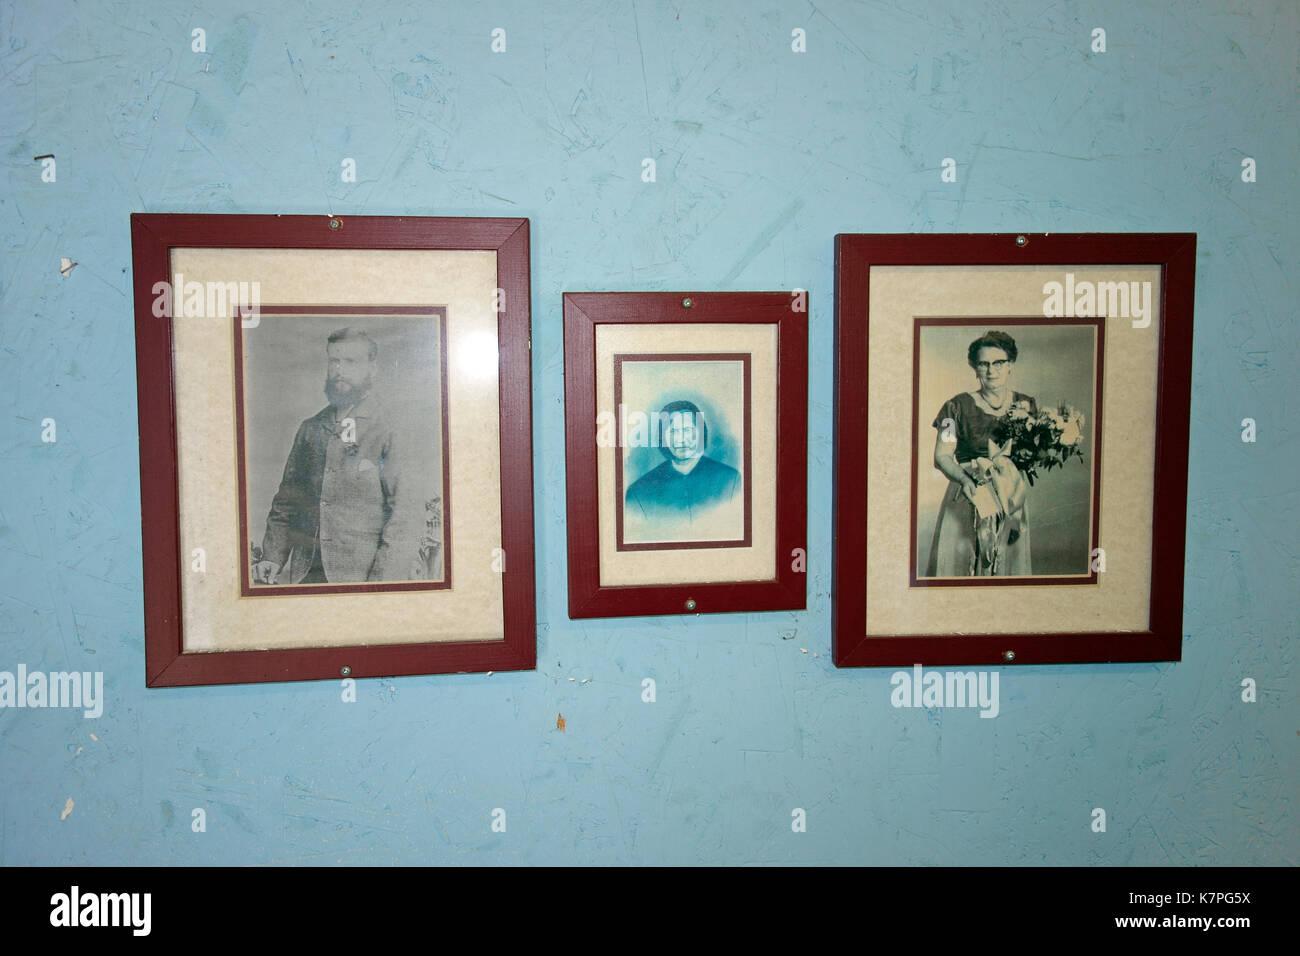 Immigrants 1920s Stock Photos & Immigrants 1920s Stock Images - Alamy